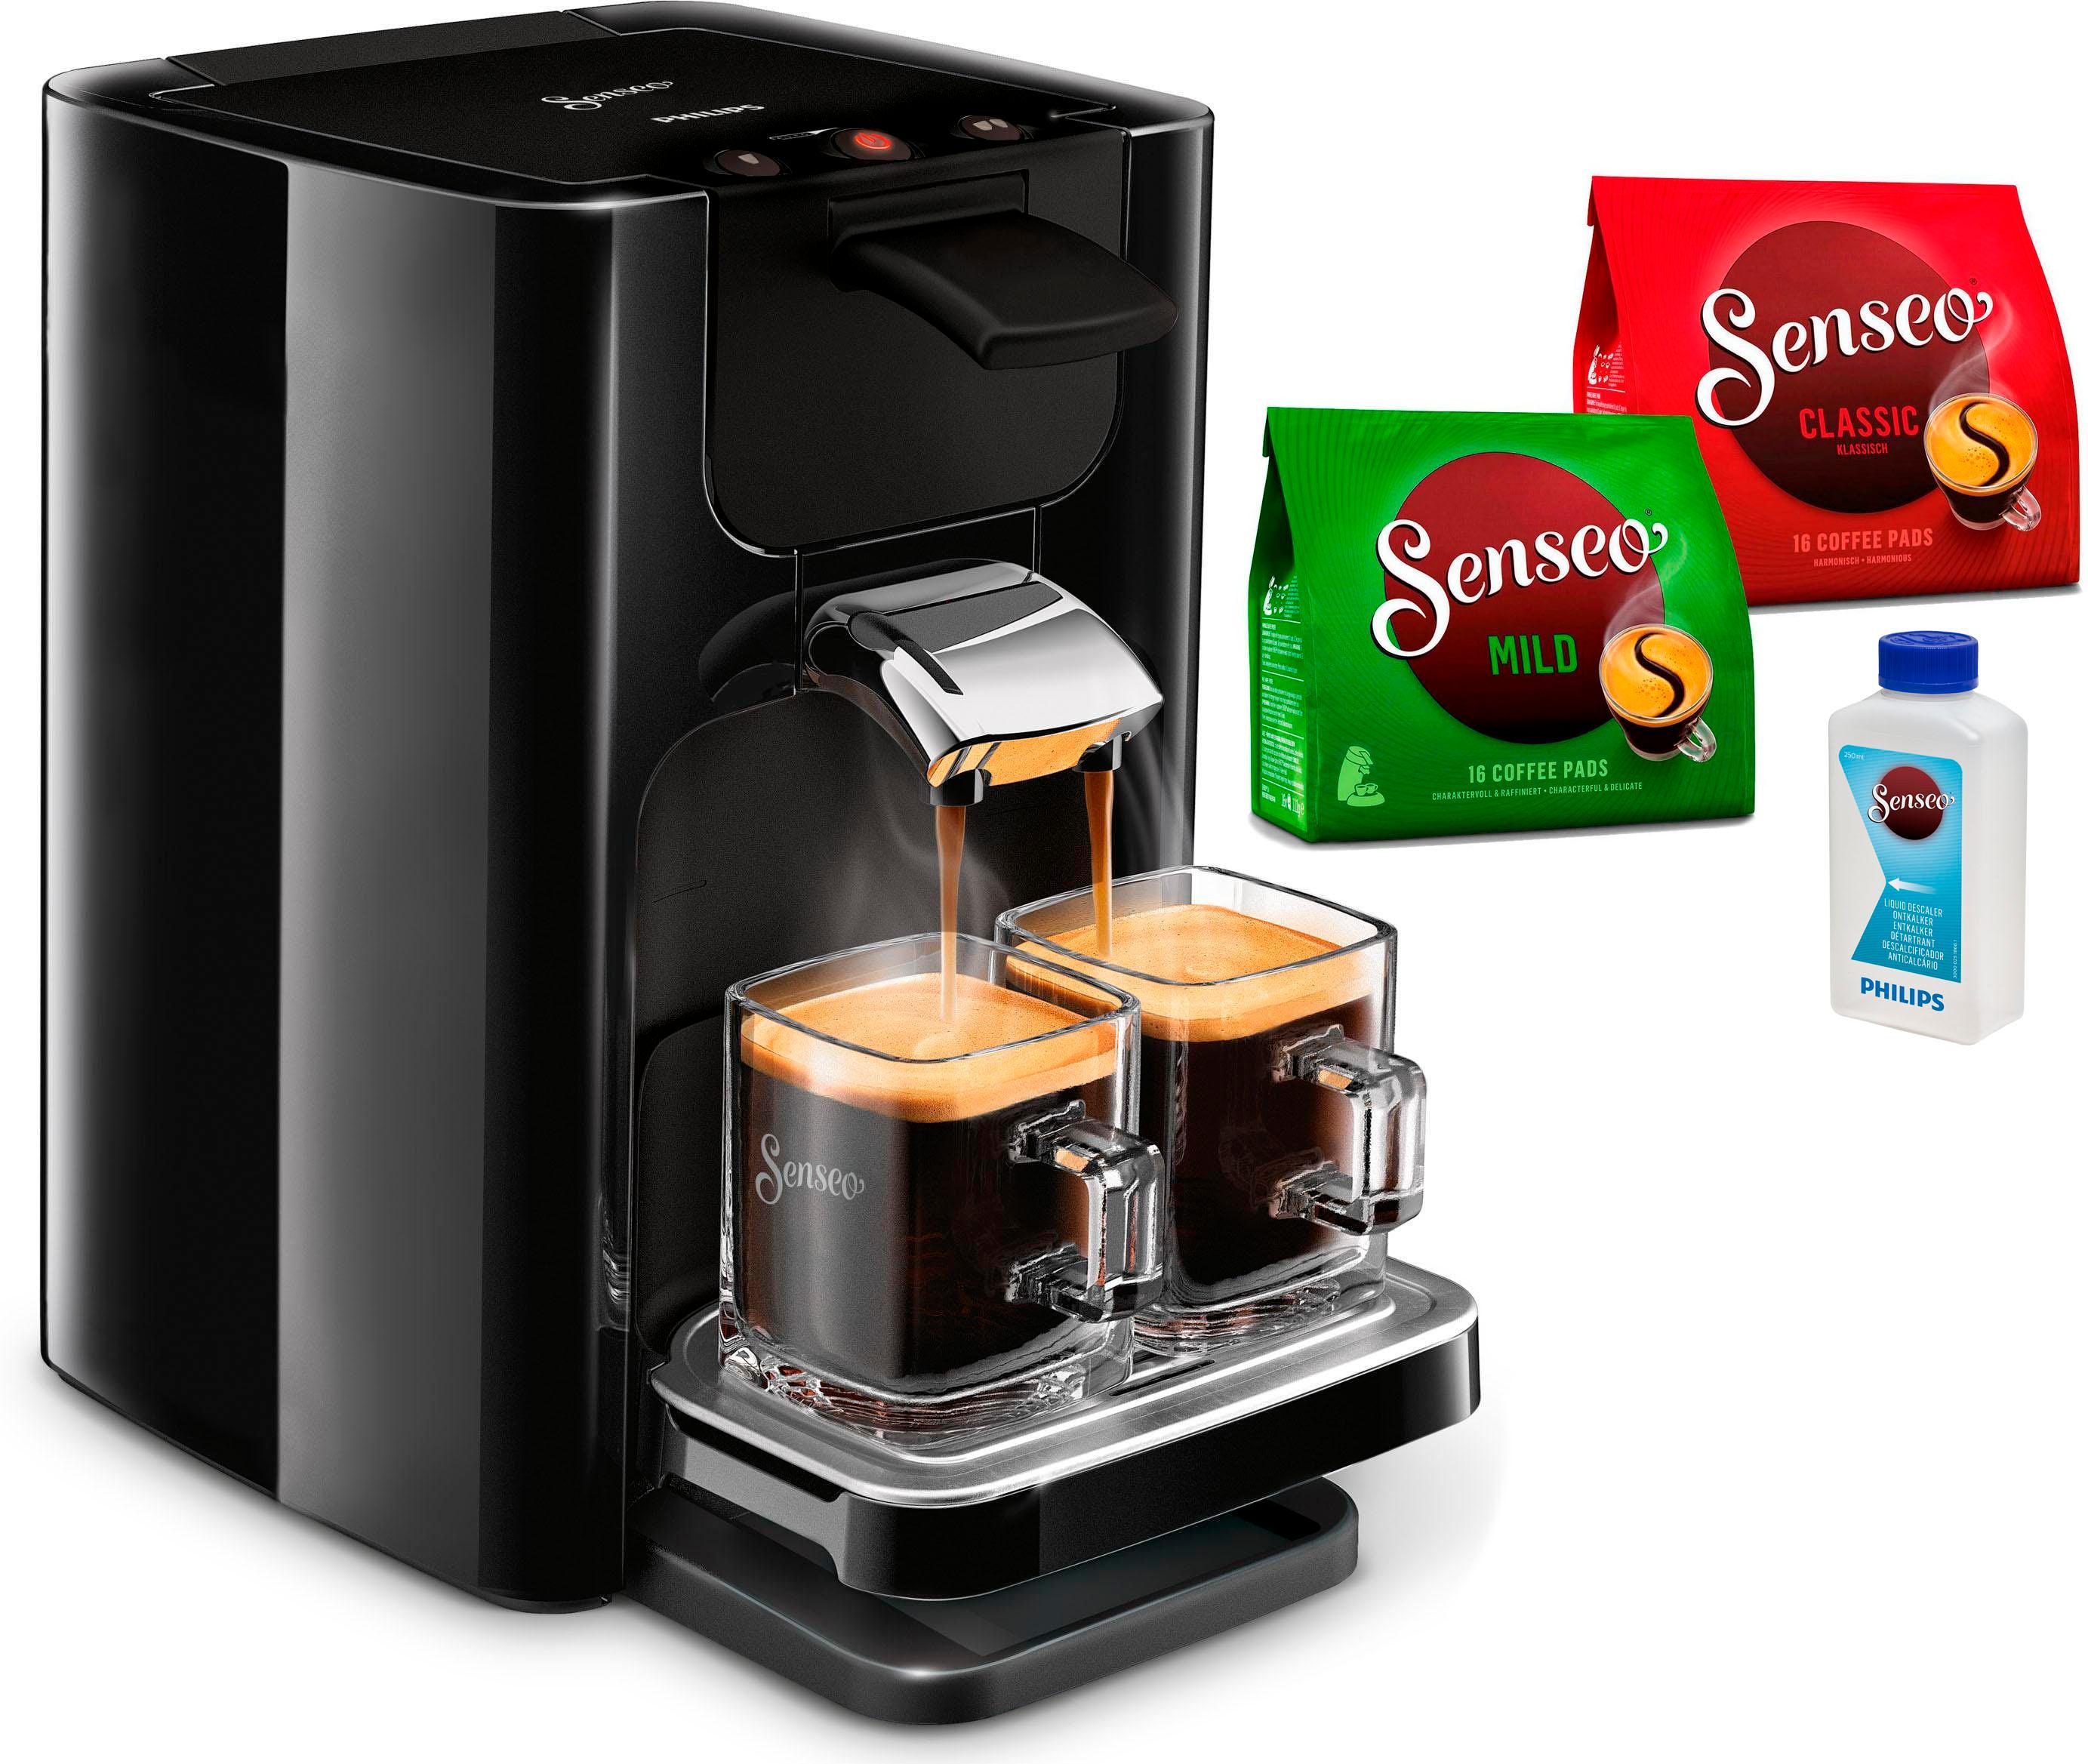 senseo kaffeepadmaschine senseo quadrante hd7865 60 auf. Black Bedroom Furniture Sets. Home Design Ideas